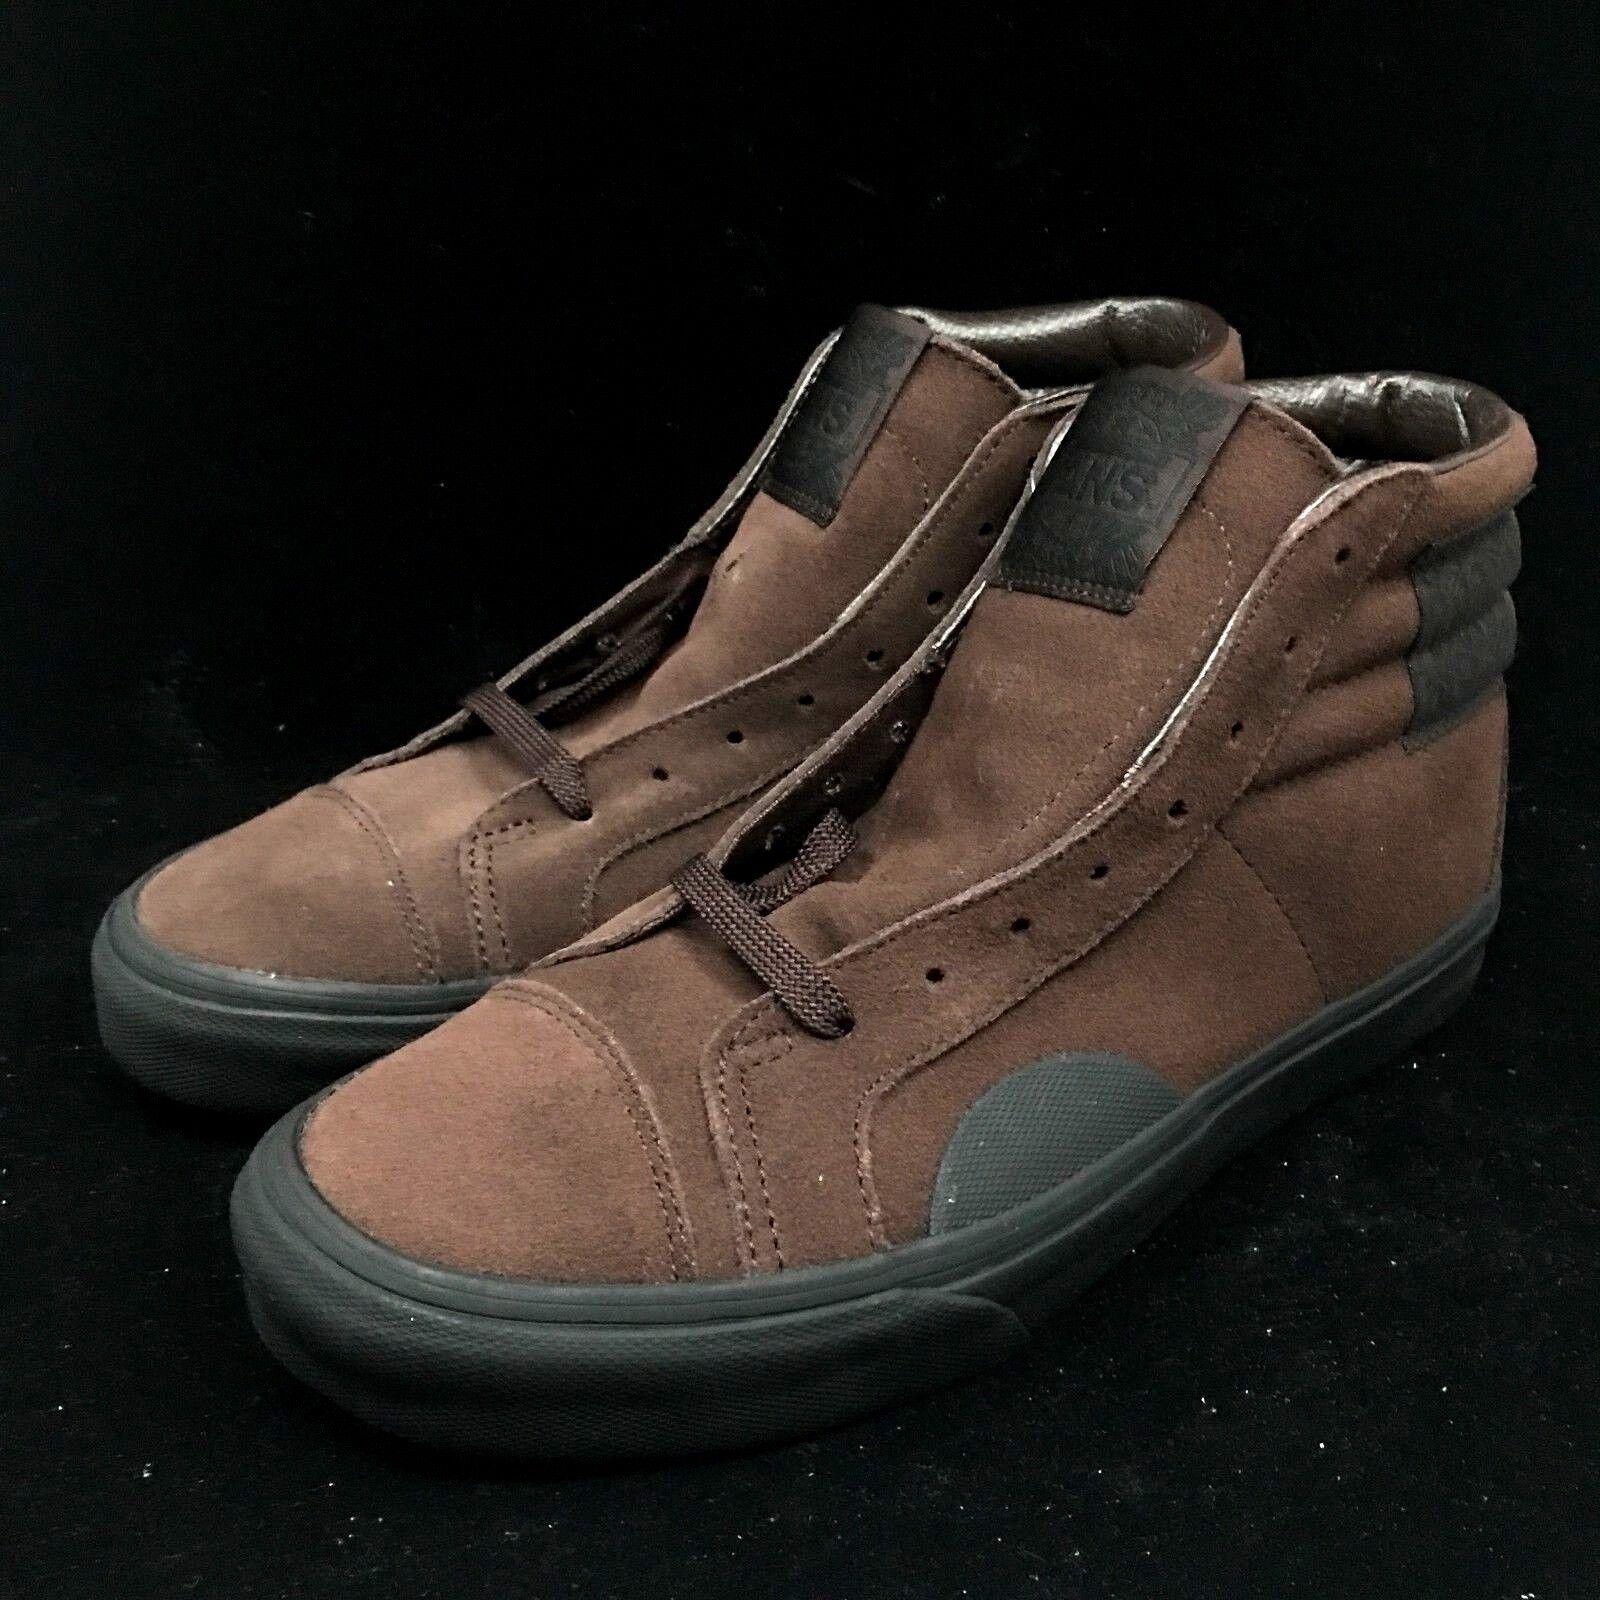 Vans Style 238 Suede Black Brown High Top VN0A3JFIQXQ Boot Hi